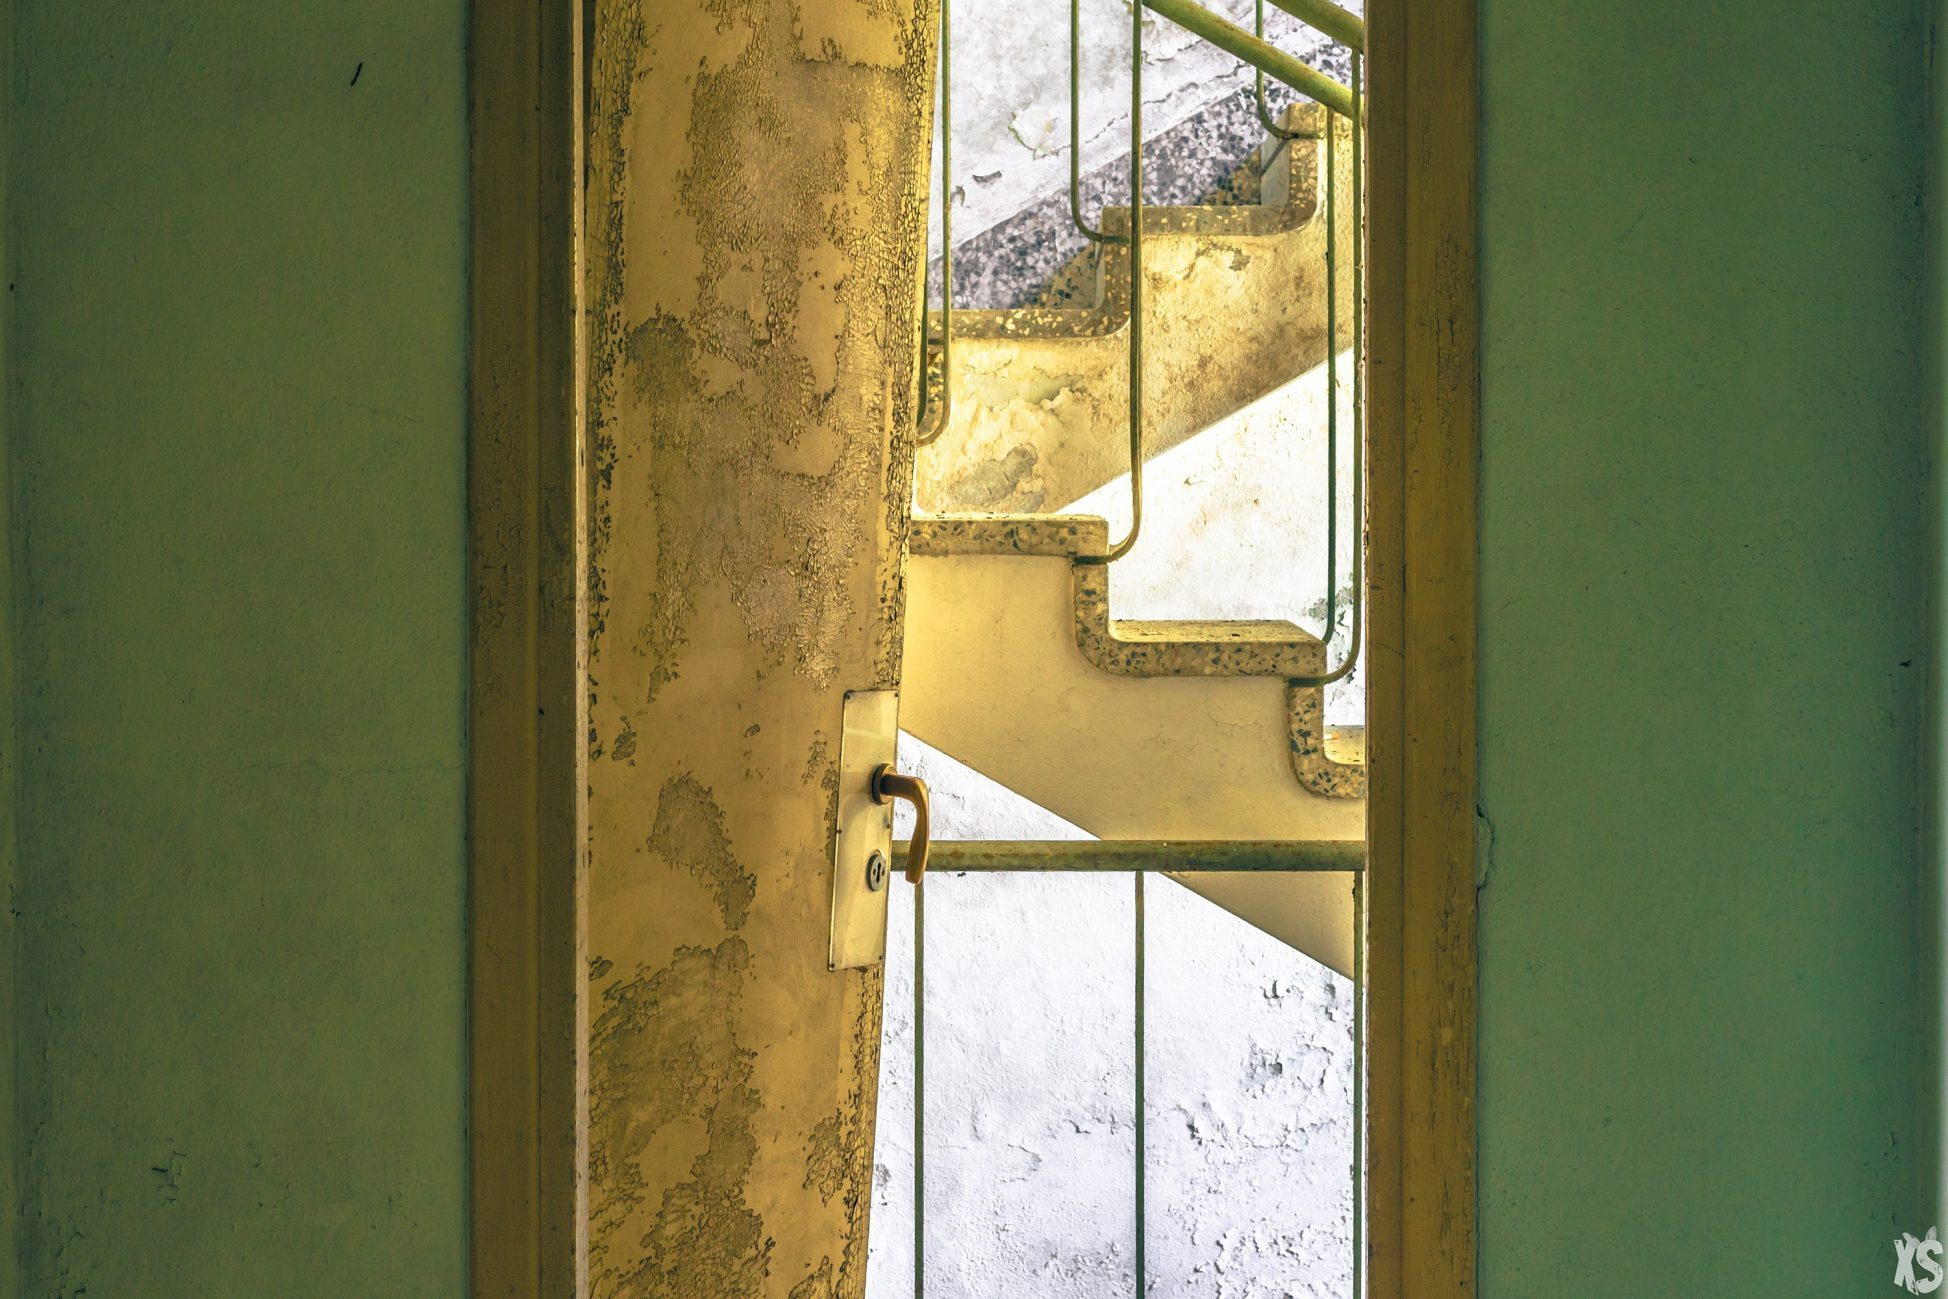 sanctuaire-bertha-gifford-7